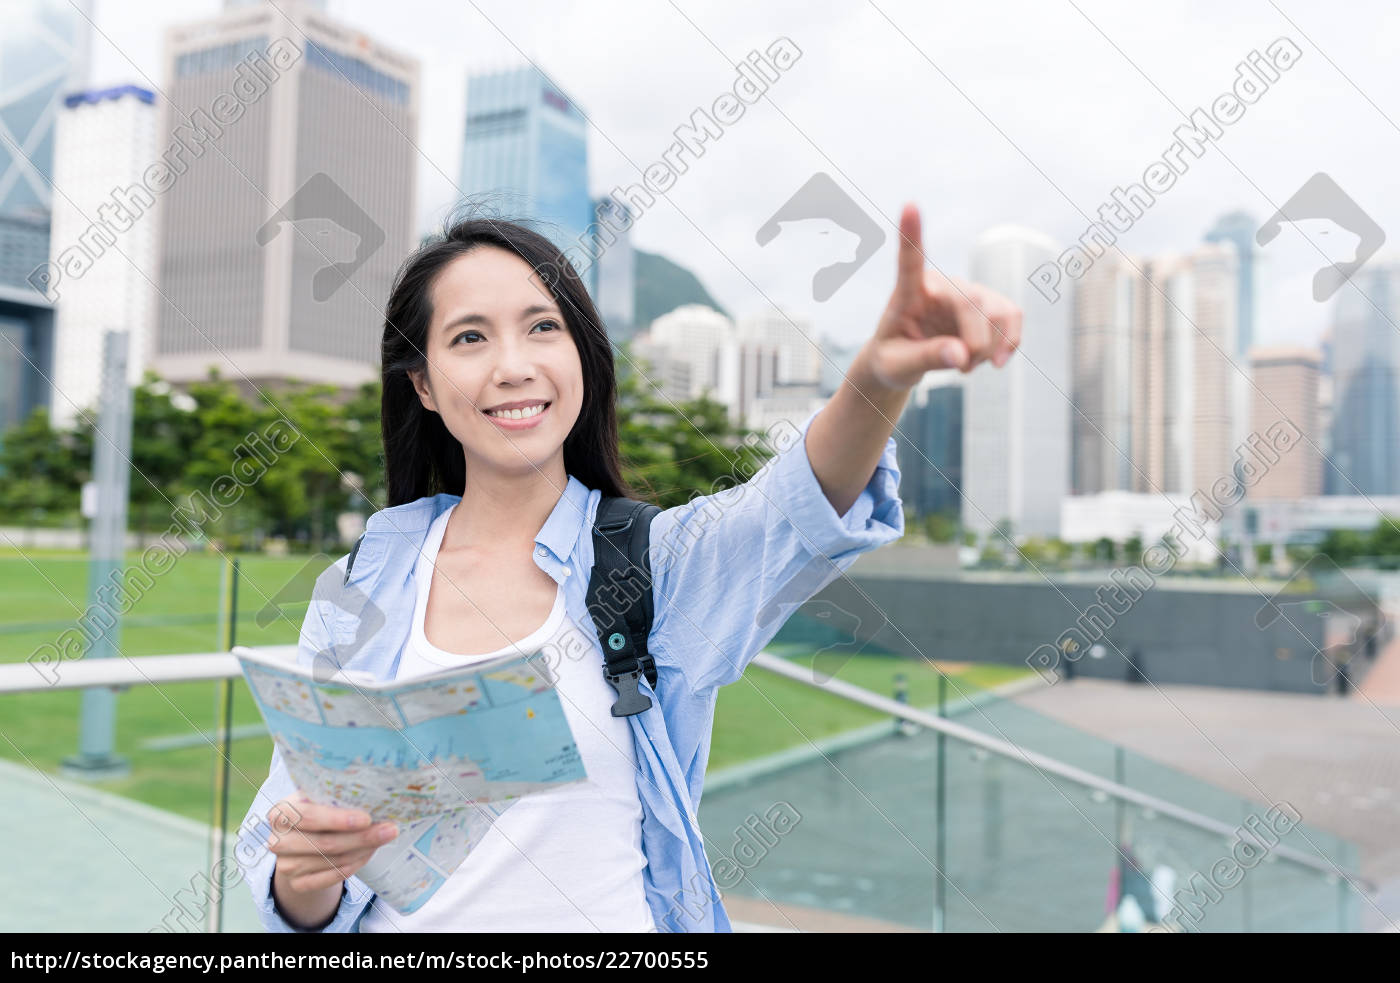 woman, using, city, map, in, hong - 22700555